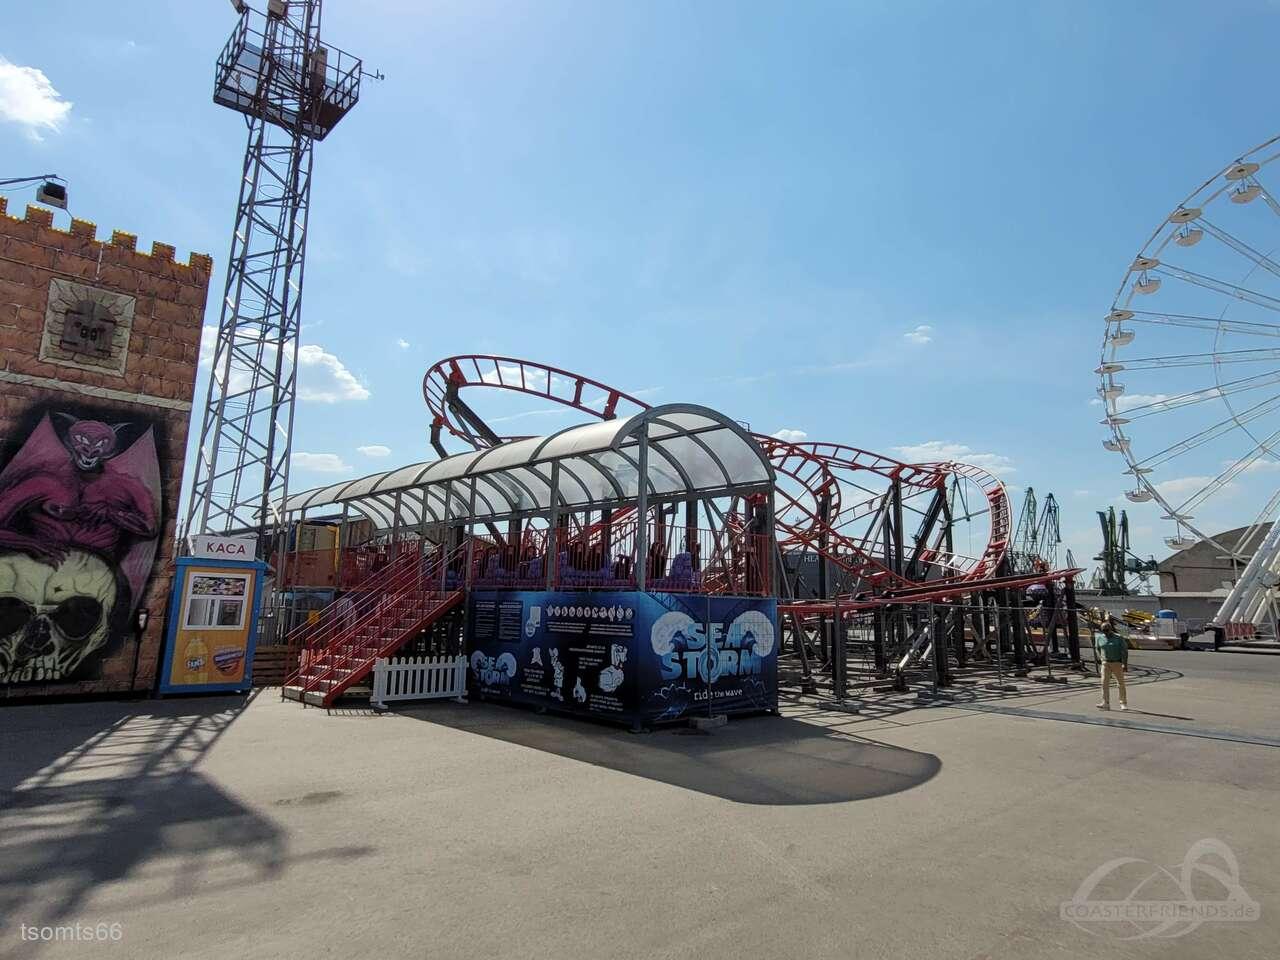 Varna Fun Port Impressionen